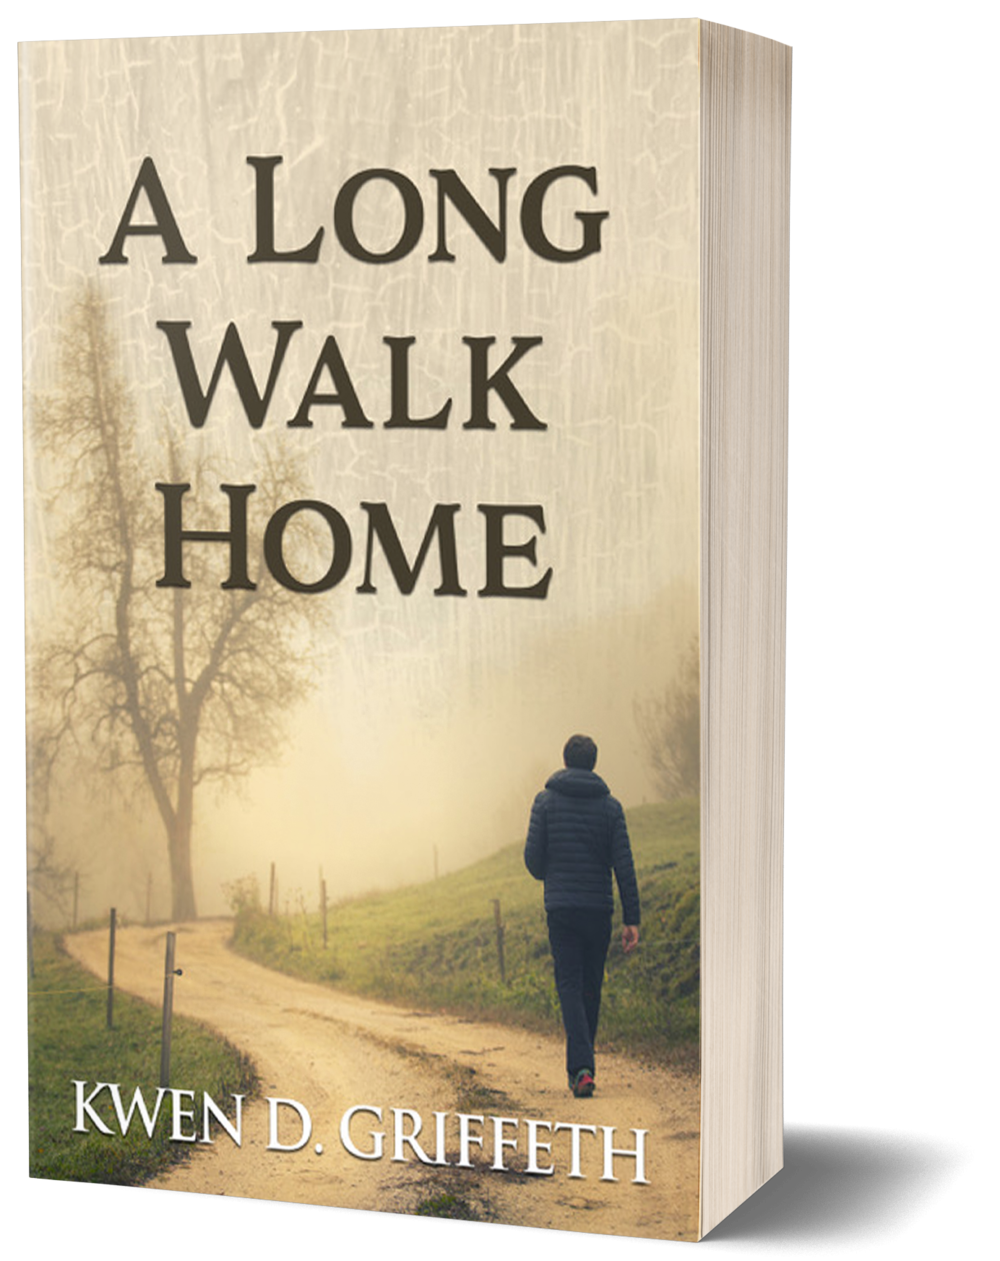 a long walk home book mockup.png